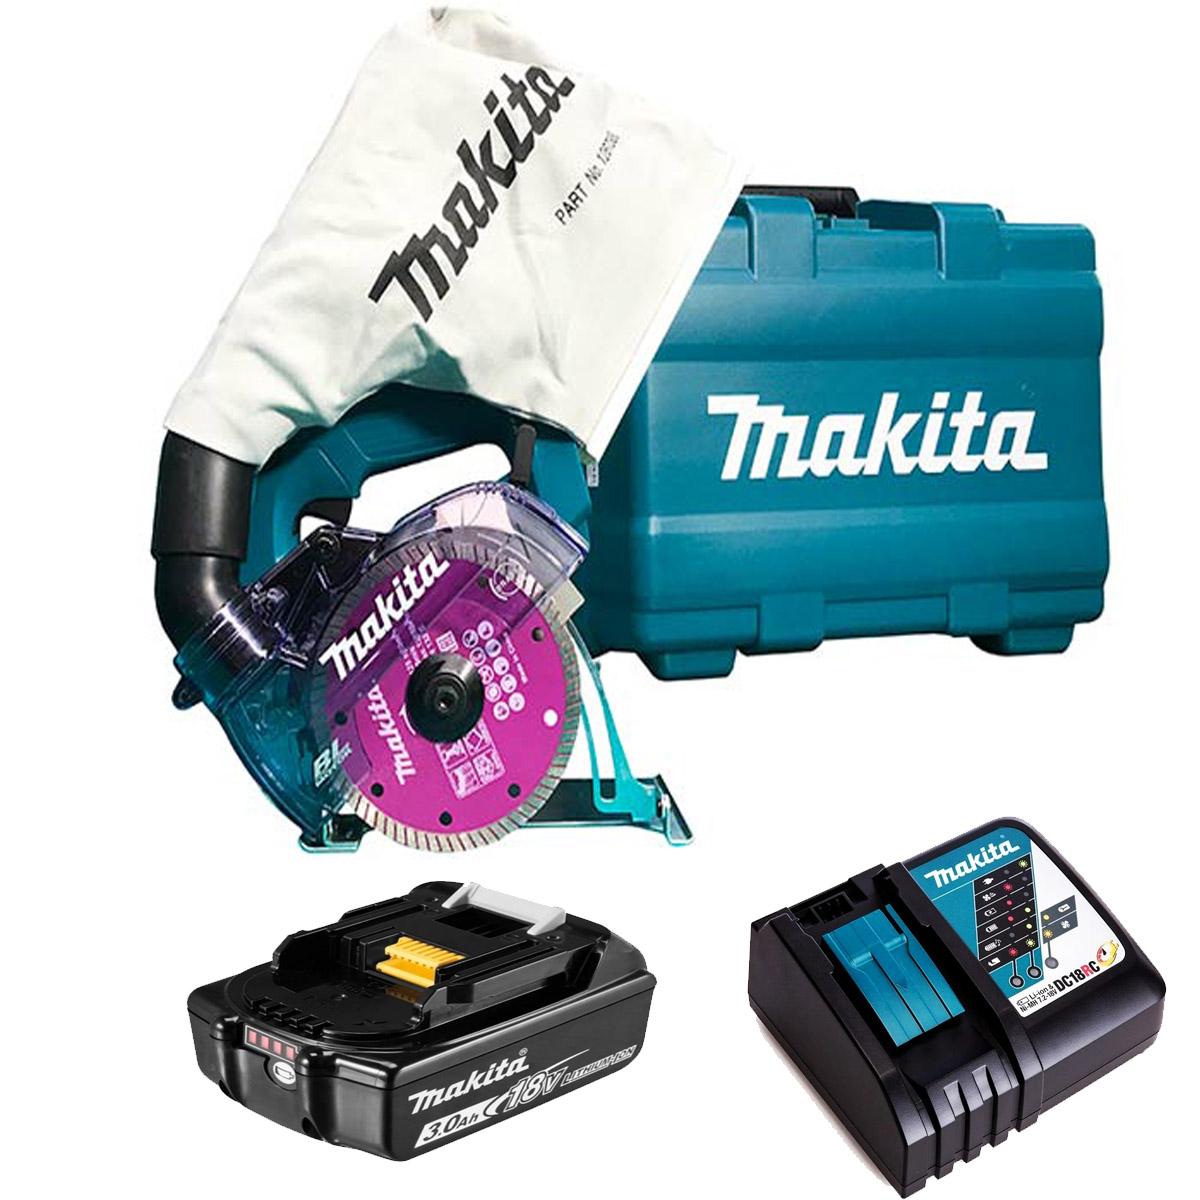 Serra Mármore 125mm + Carregador + Bateria + Maleta Makita